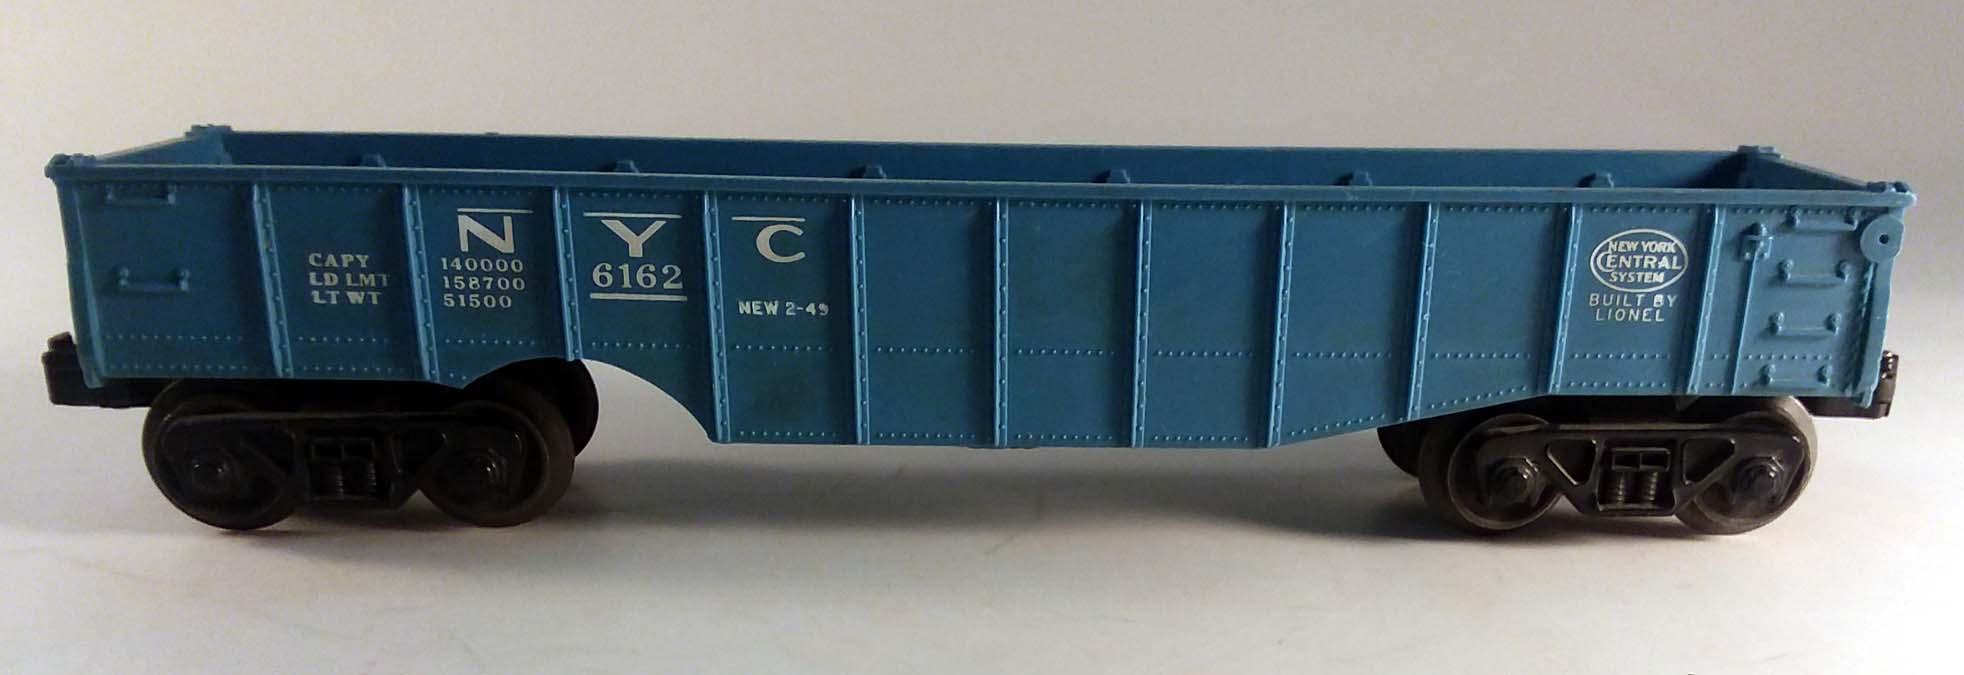 Lionel New York Central RR blue gondola 6162 no load 1959-1968